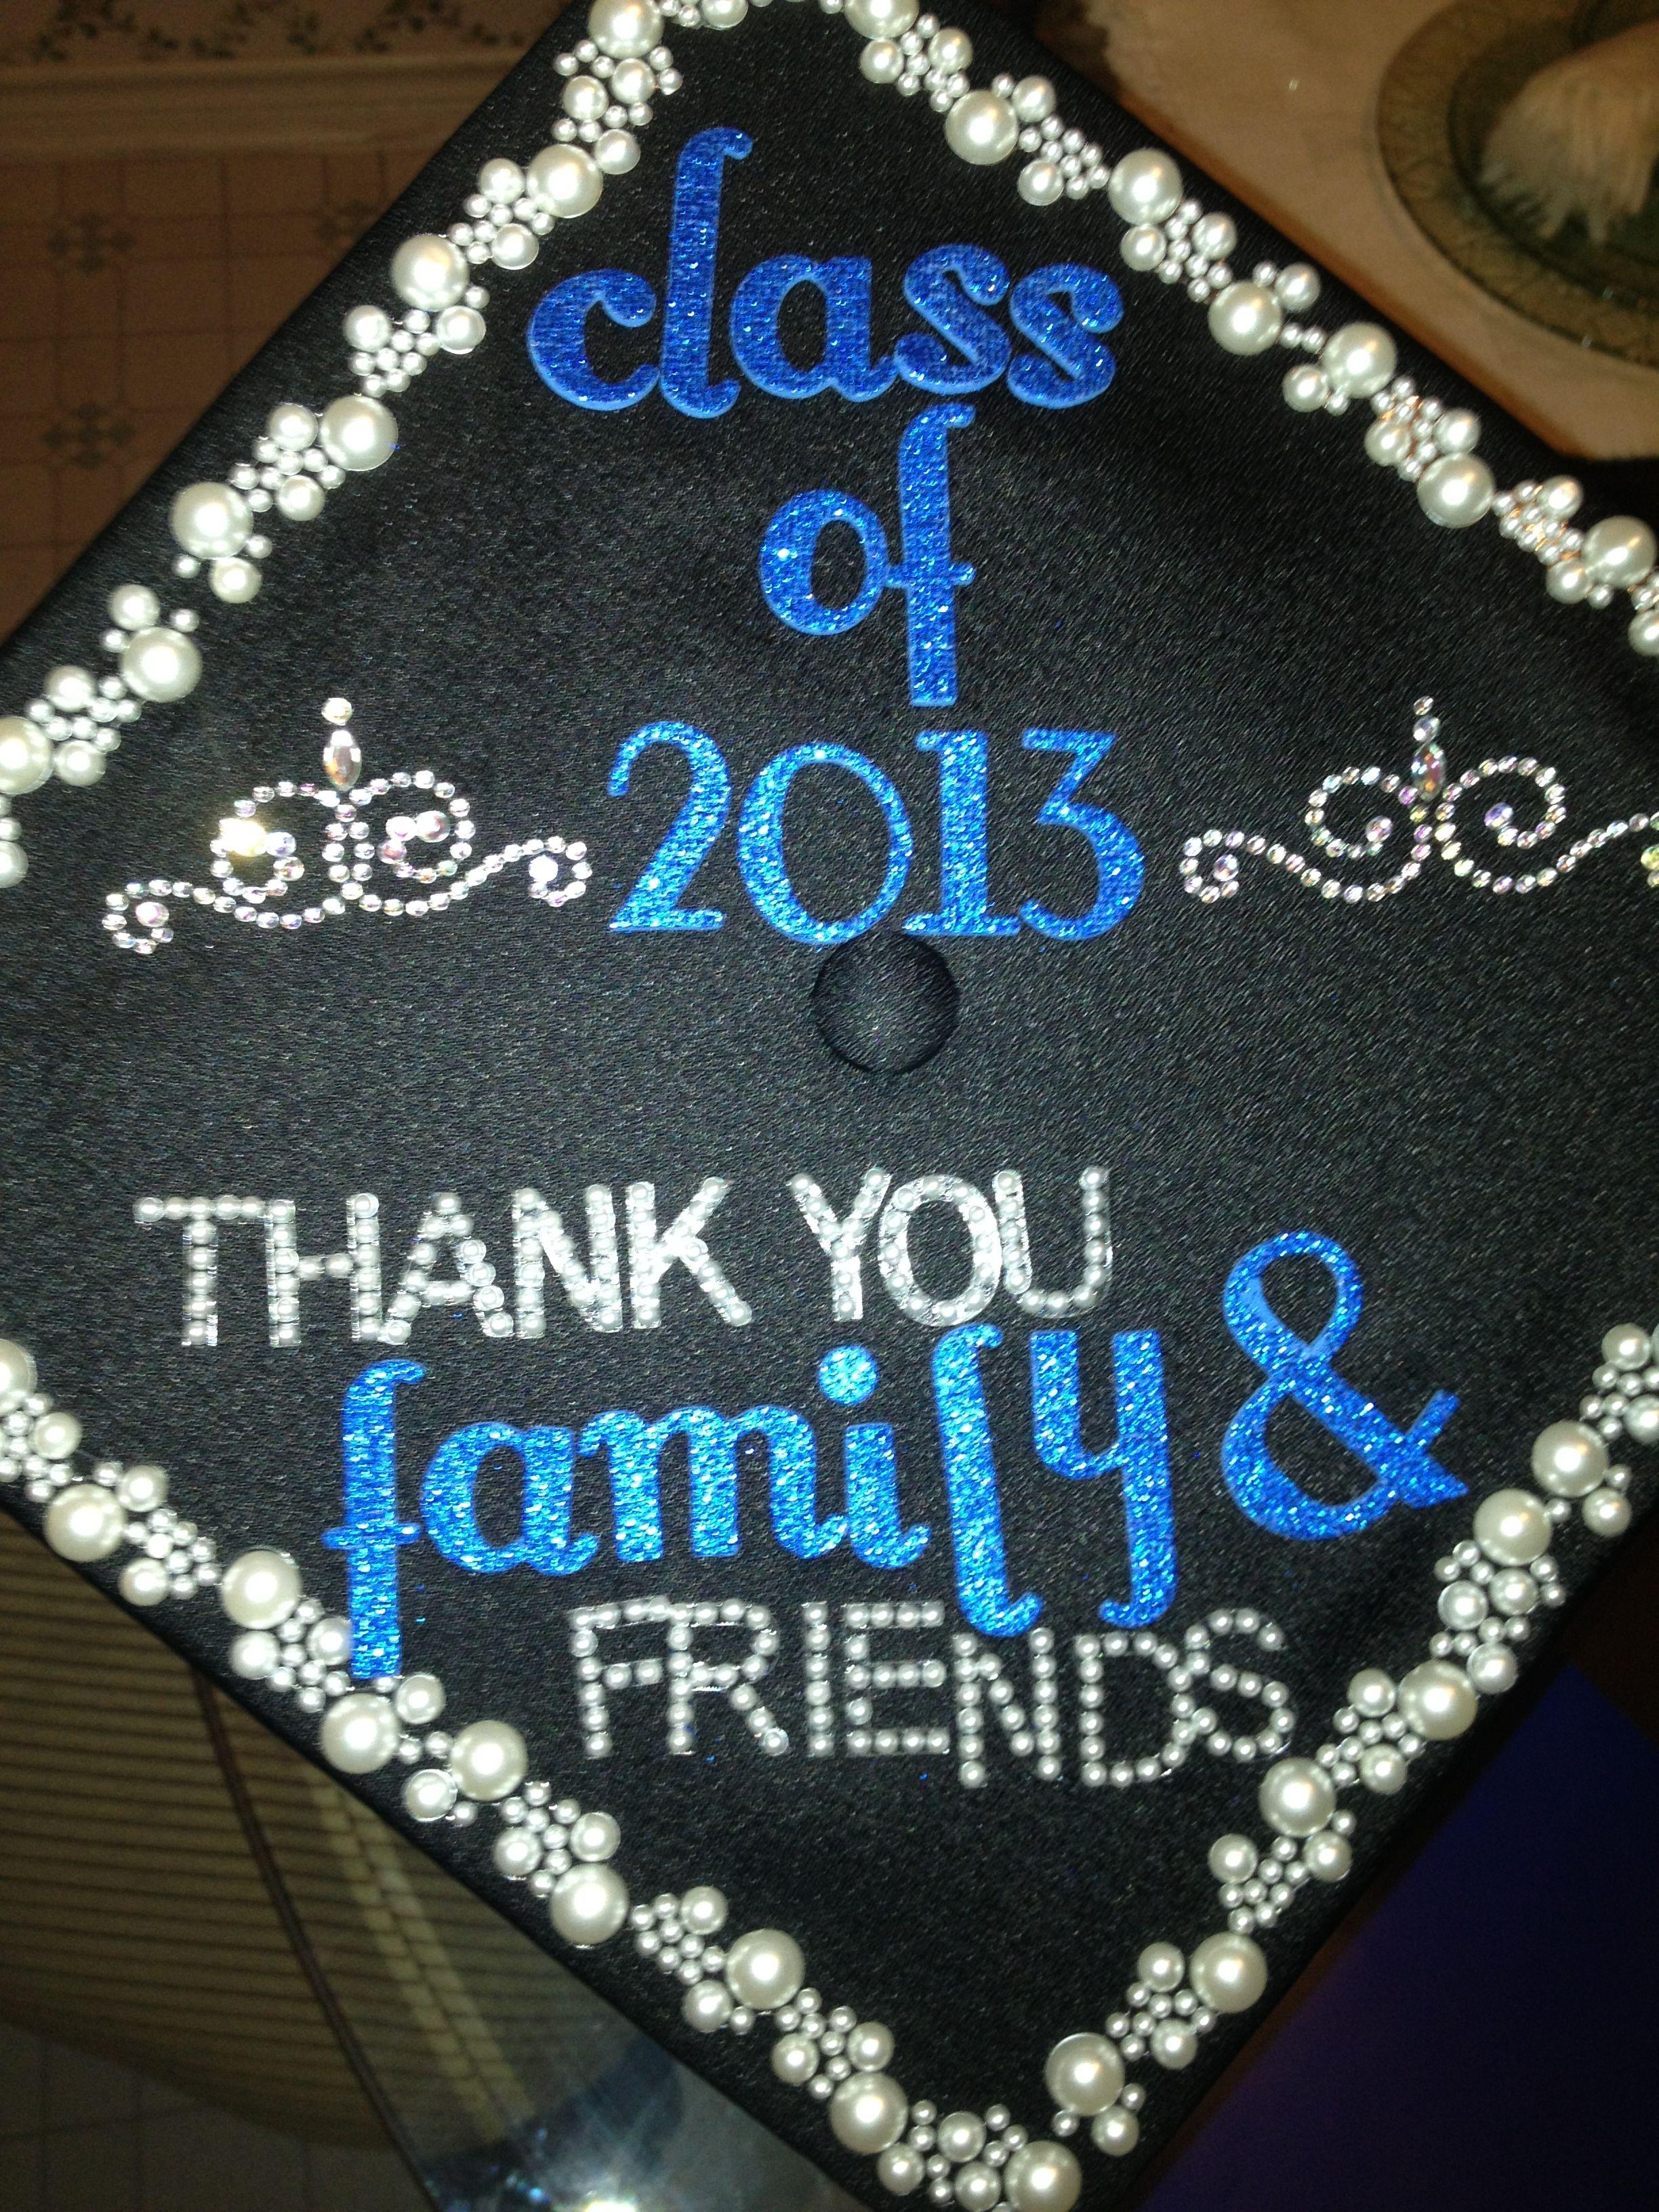 Decorations on graduation cap craft ideas pinterest for Graduation decorations